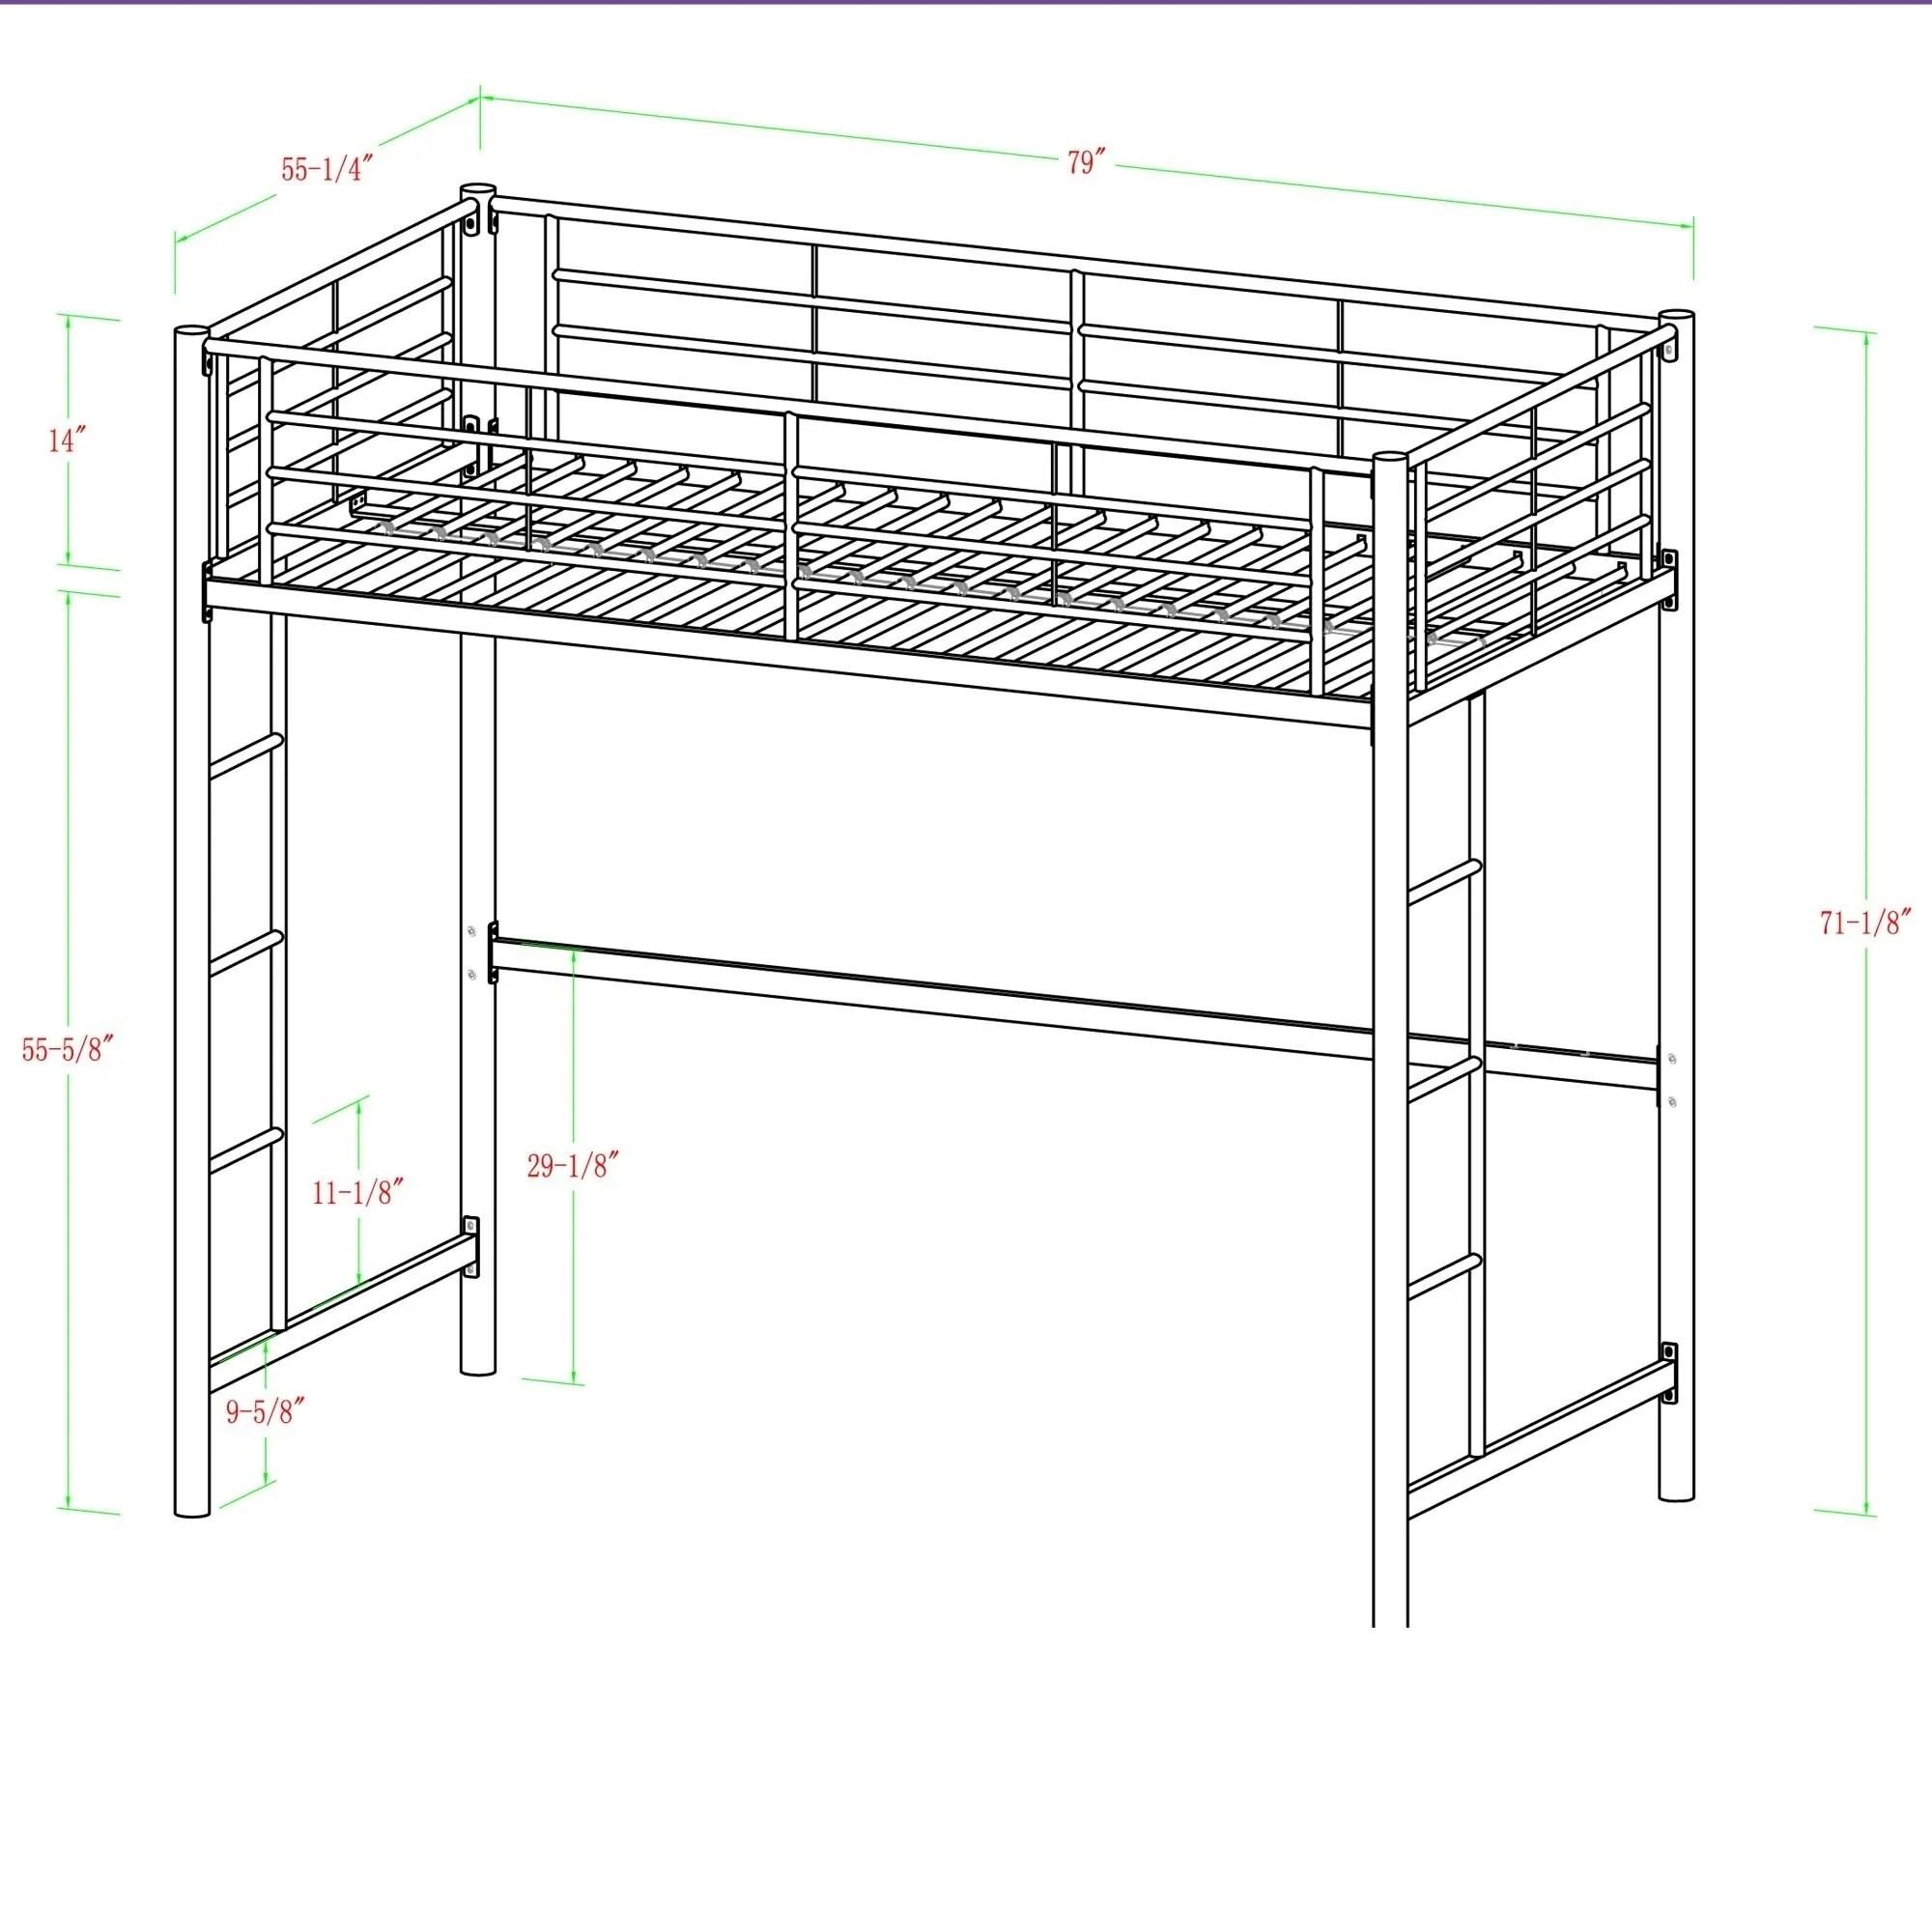 hight resolution of loft bed diagram wiring diagrams schematic adult loft bed diagram loft bed diagram